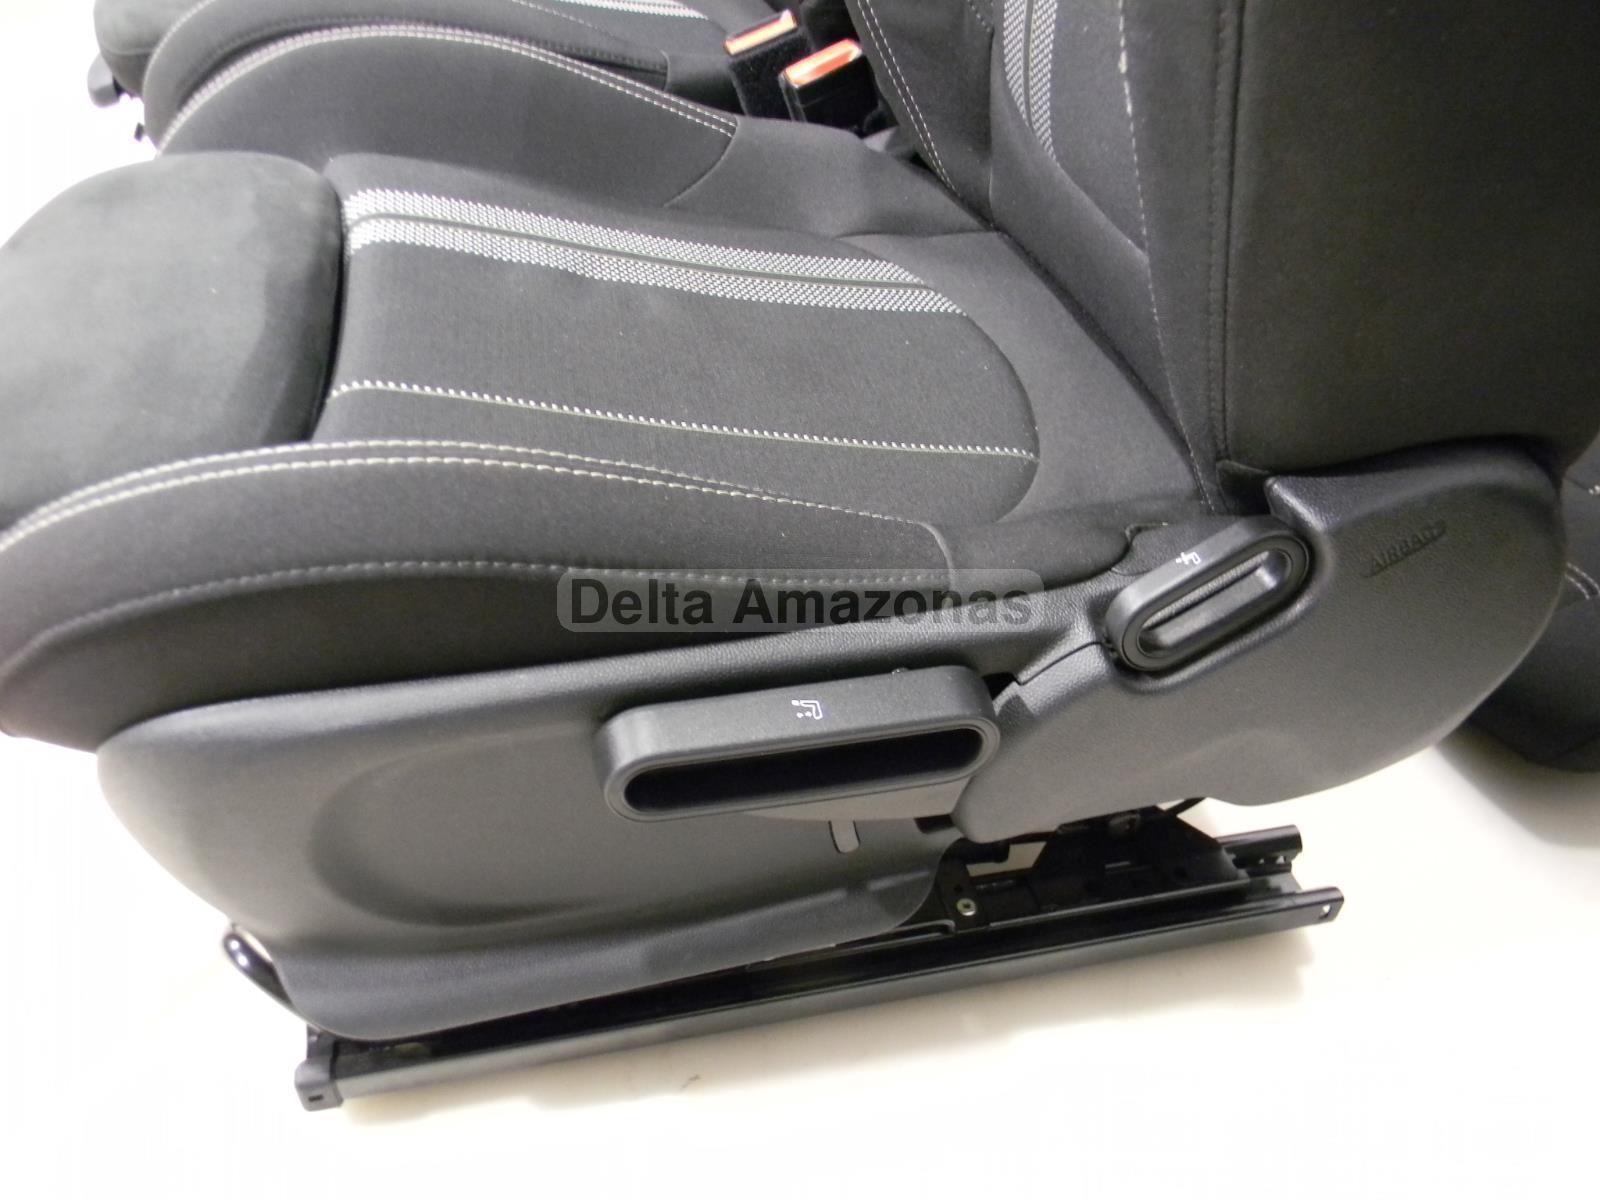 mini f56 ledersitze jcw sportsitze sitze leder dinamica stoff carbon black ebay. Black Bedroom Furniture Sets. Home Design Ideas